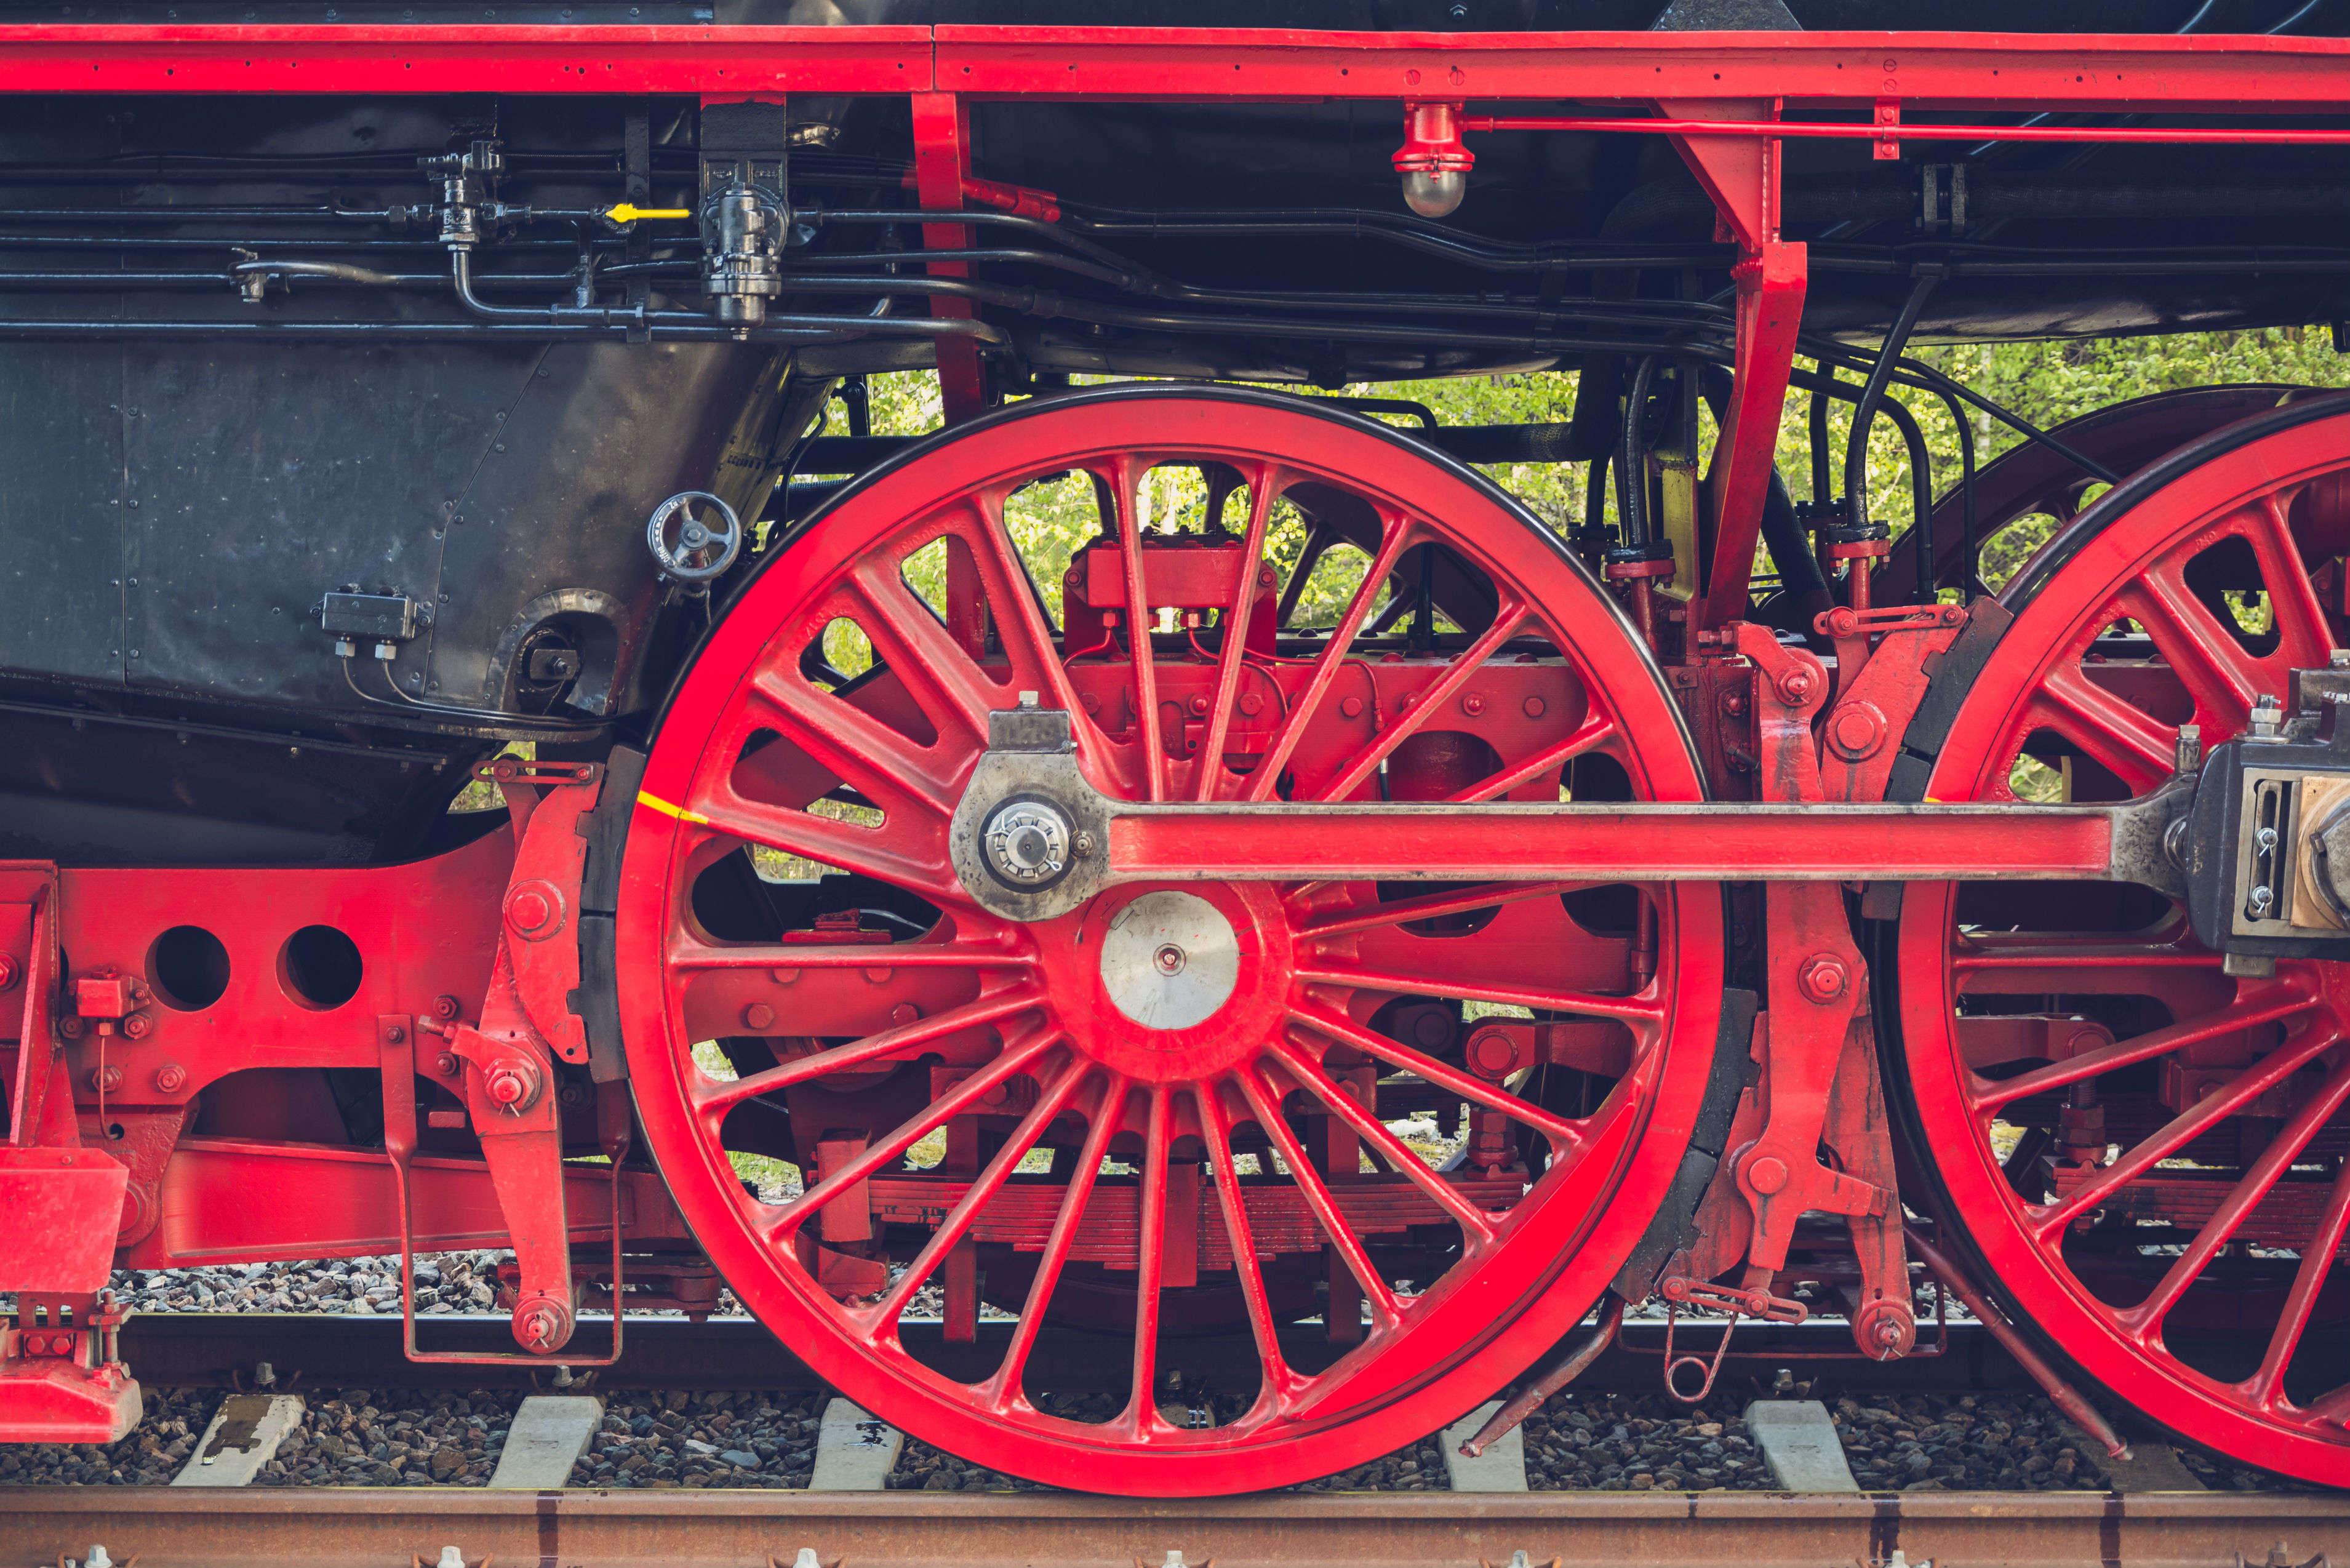 Tiruchirappalli Rail Museum attempts to display southern railway history